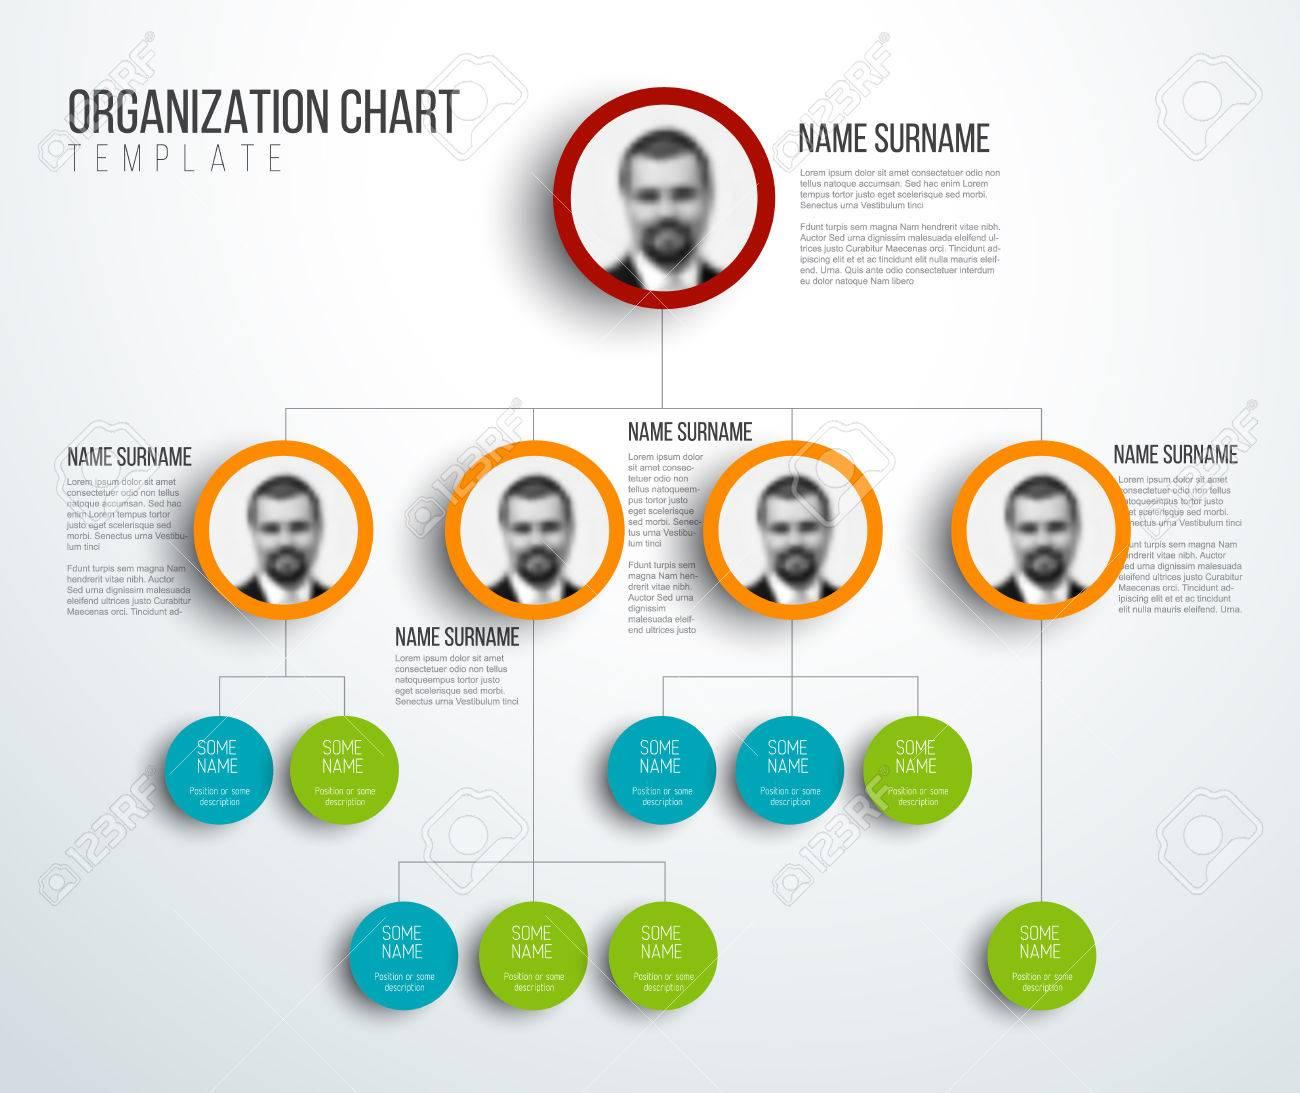 minimalist organization hierarchy chart template light version